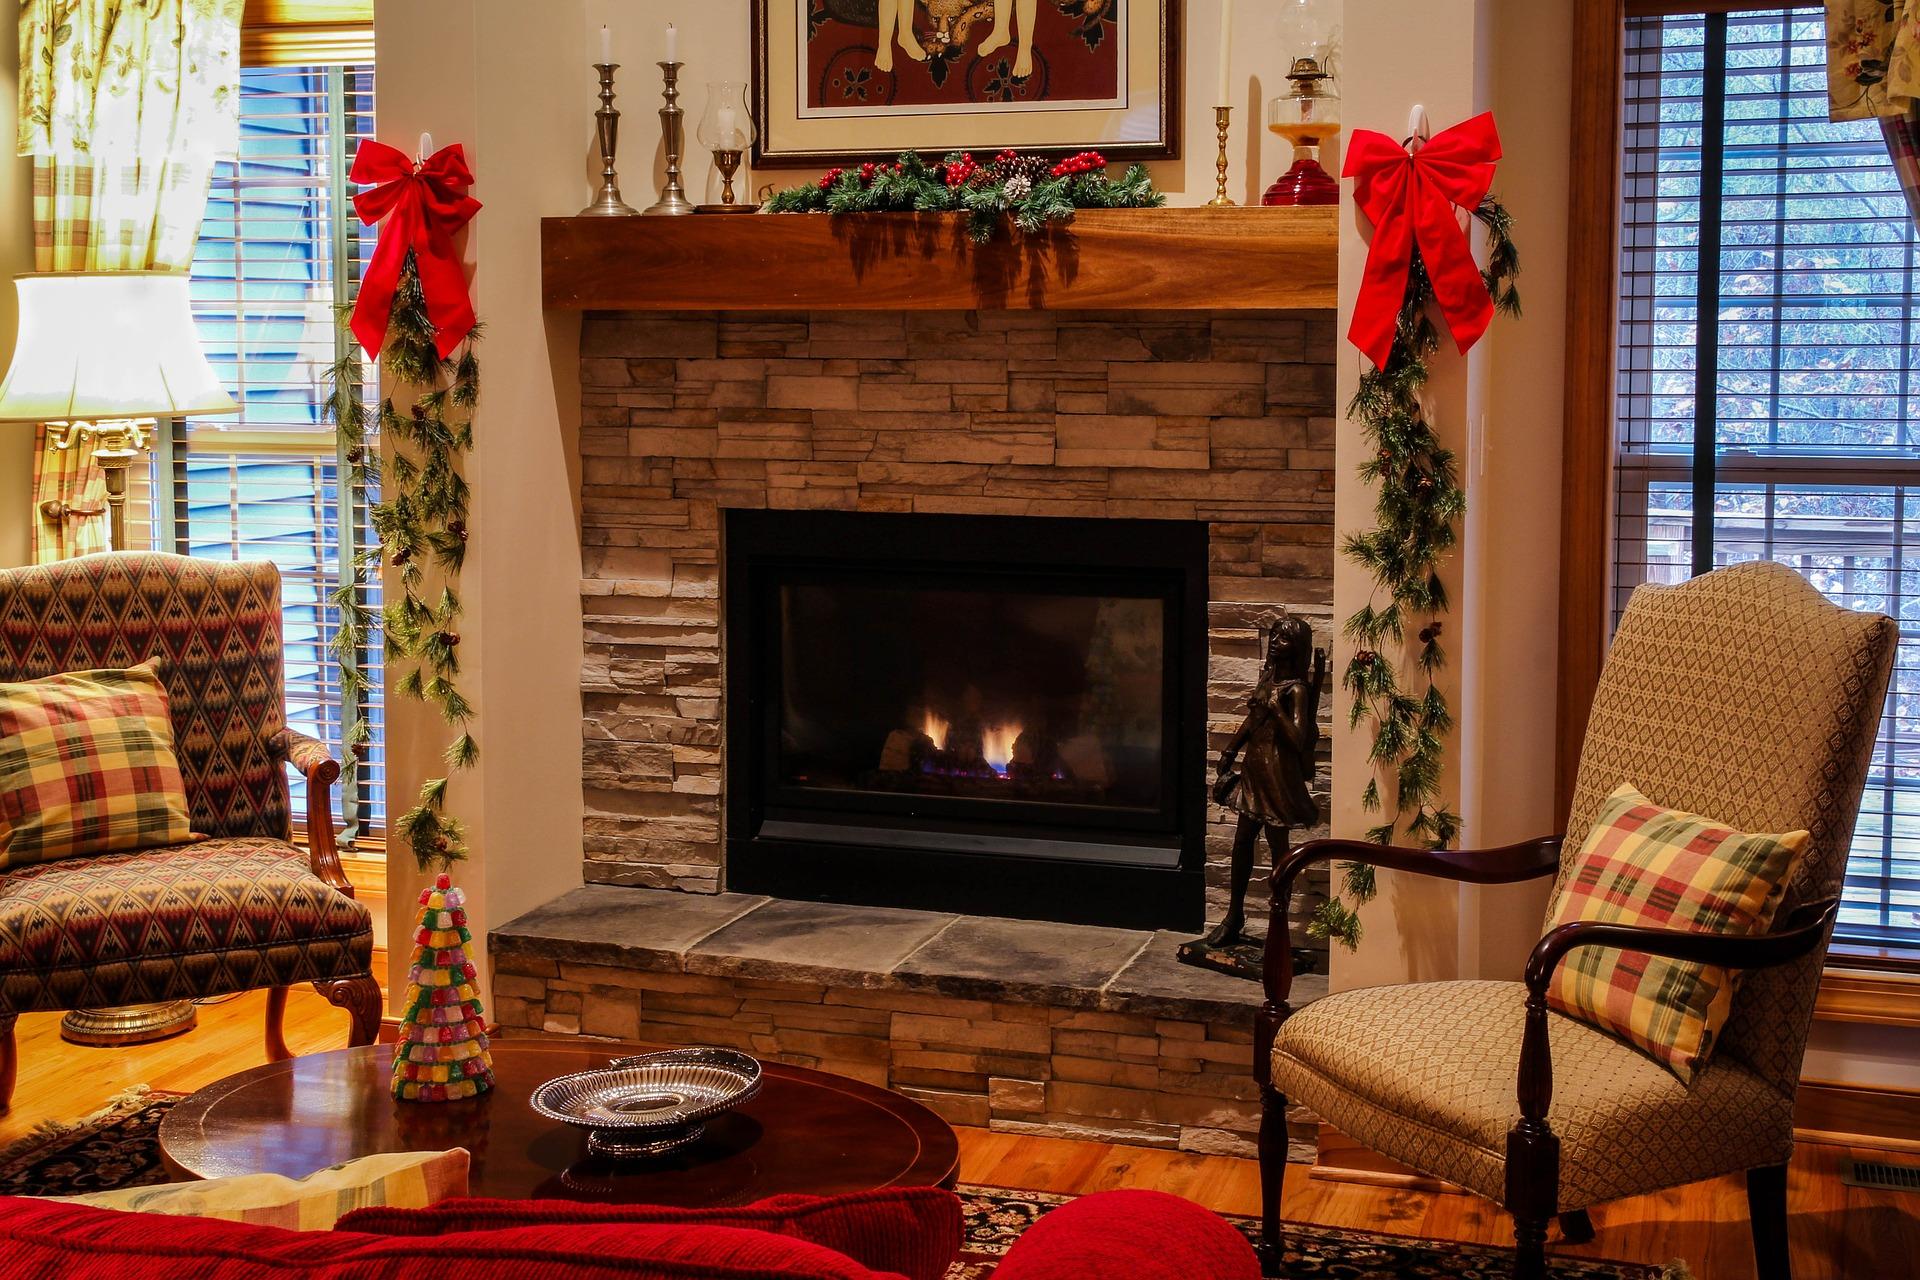 cozy seating area around lit fireplace